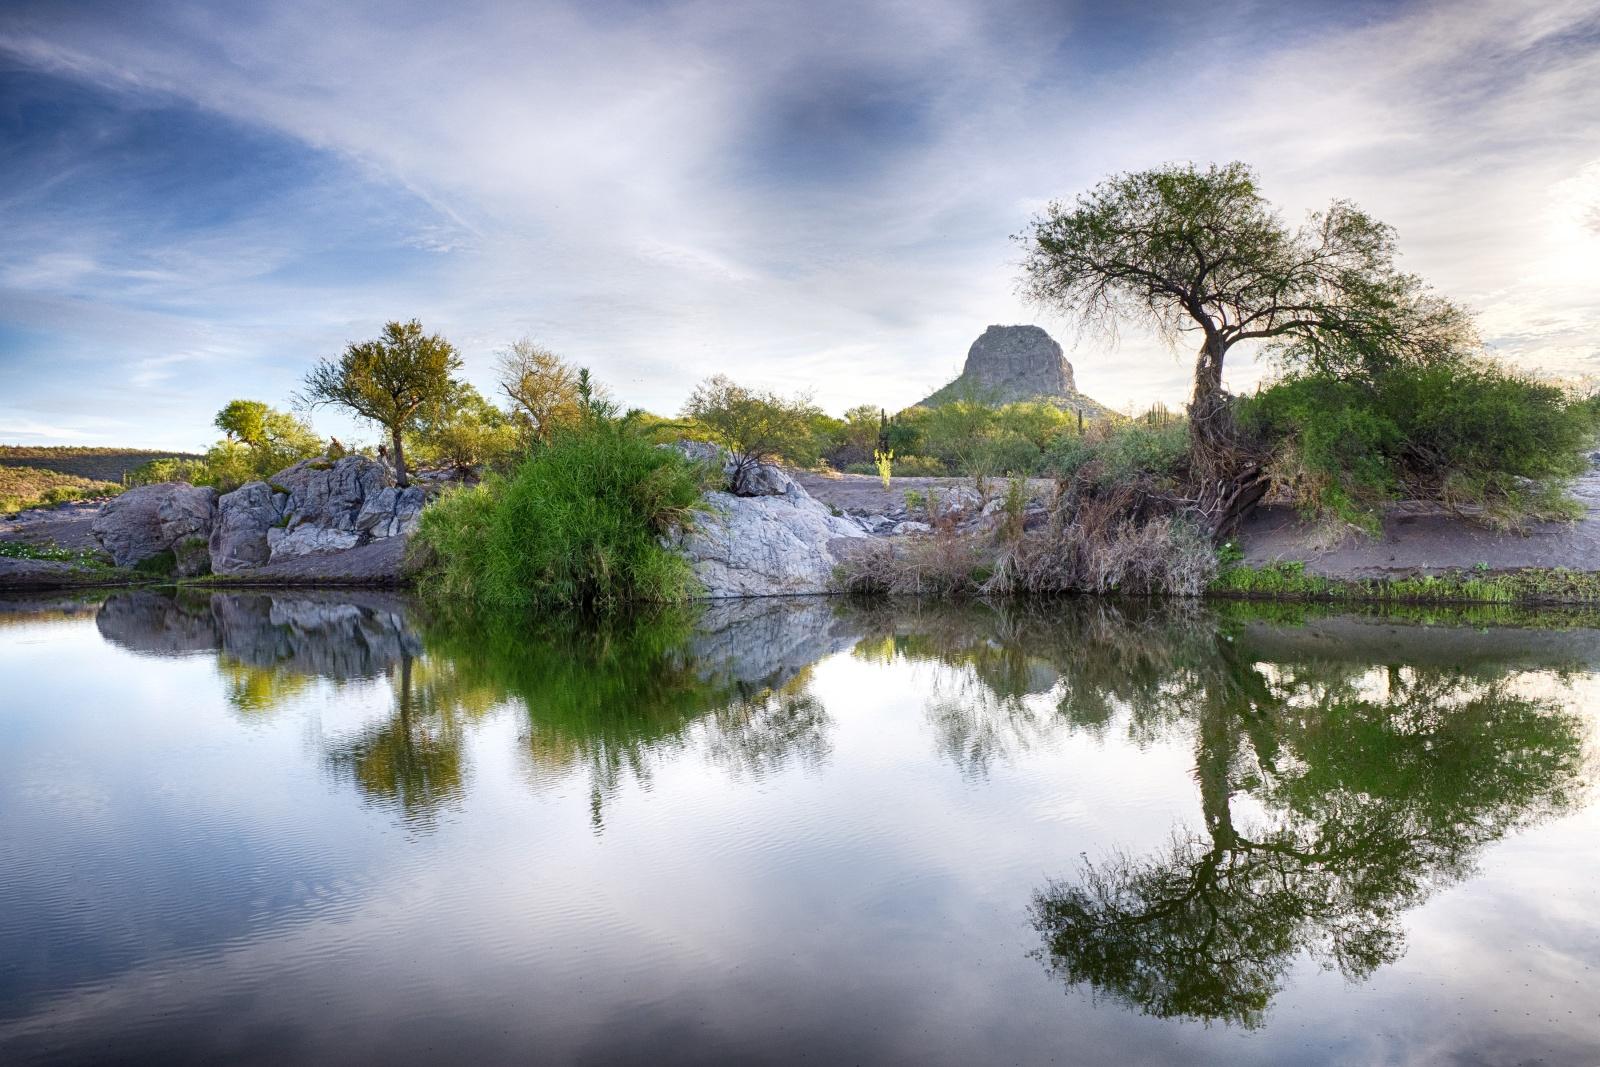 HDR Vari, Panorami  e tecniche di ripresa